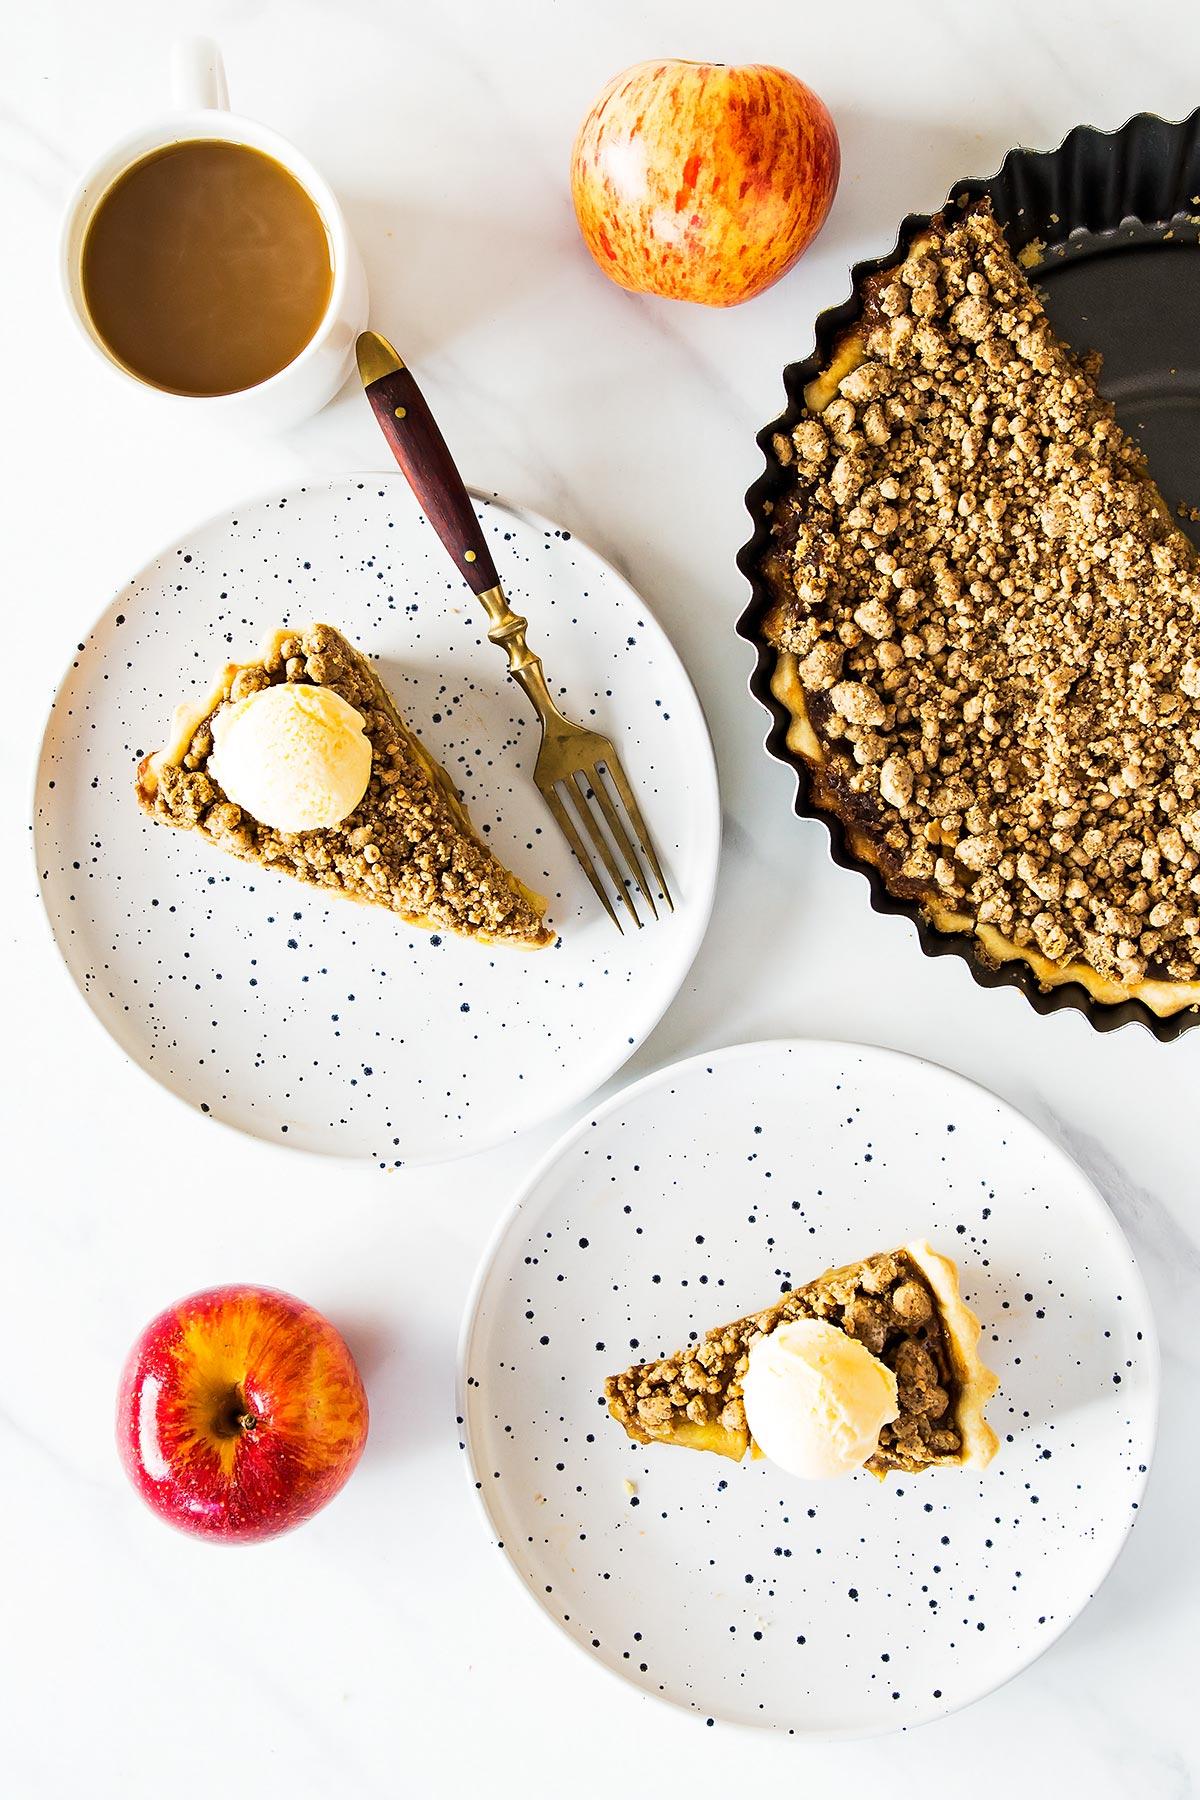 Peanut Butter Apple Slices on plates